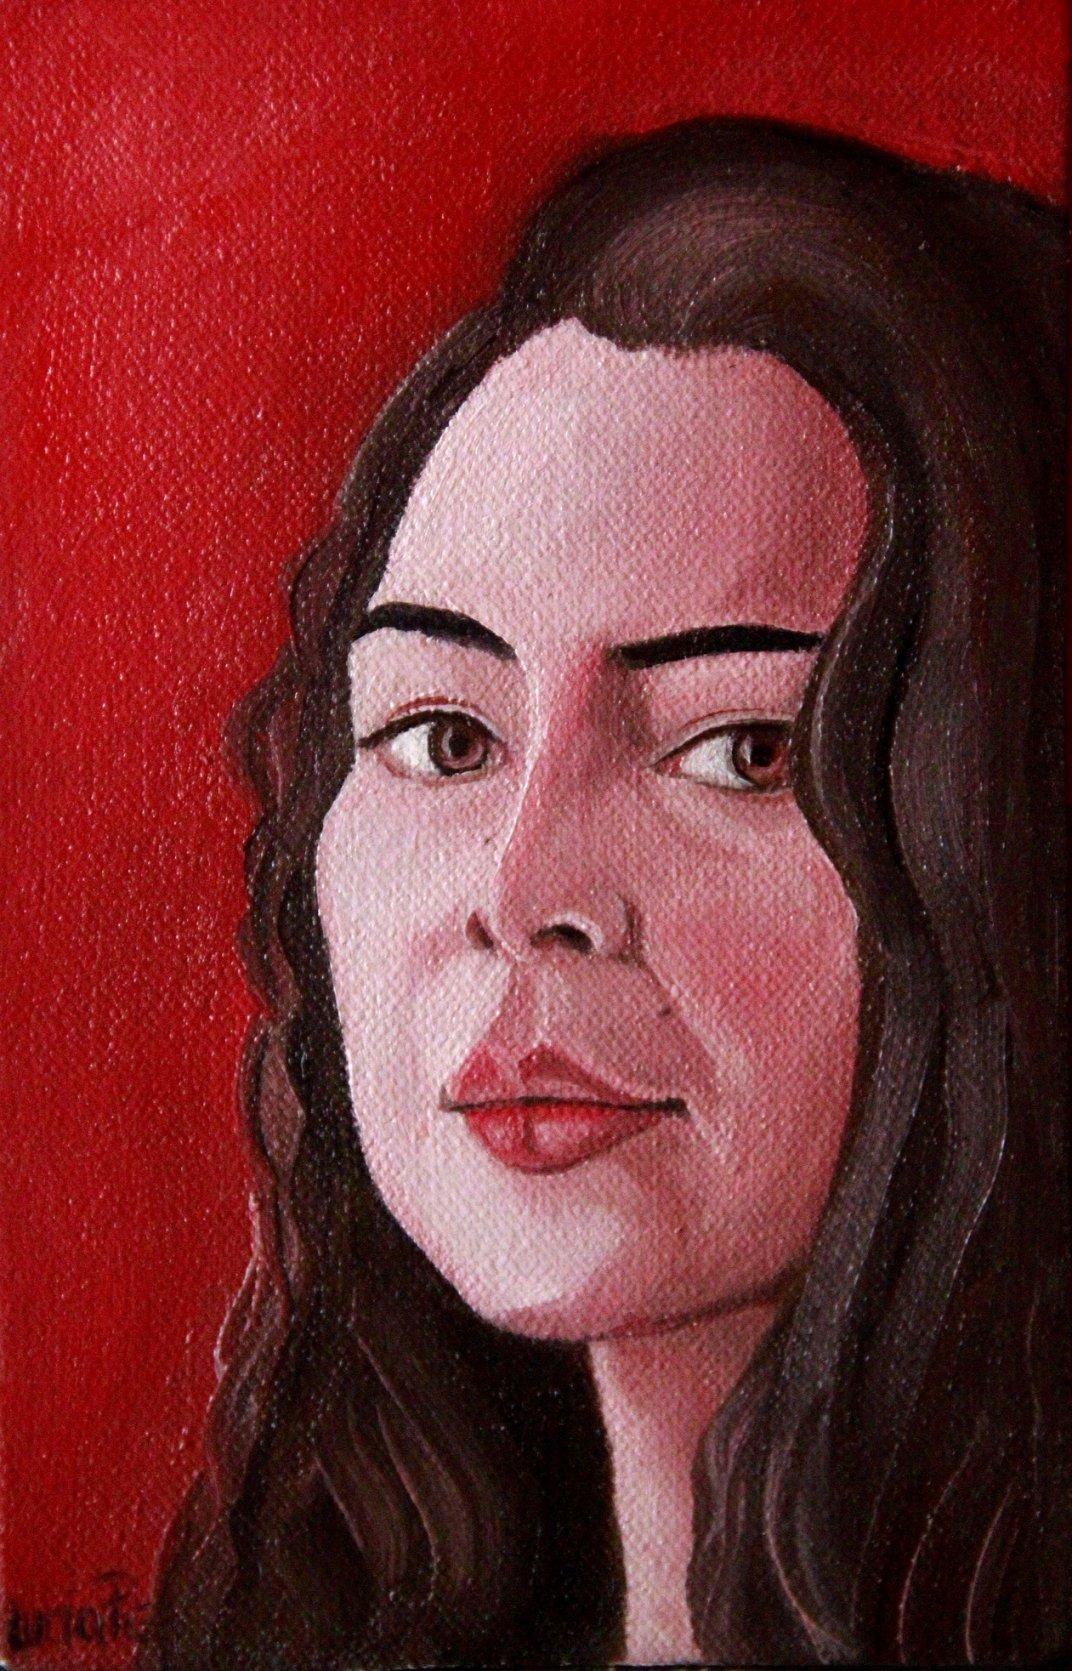 Autorretrato (2016) - Lucía Portocarrero Guzmán - Lucia PG